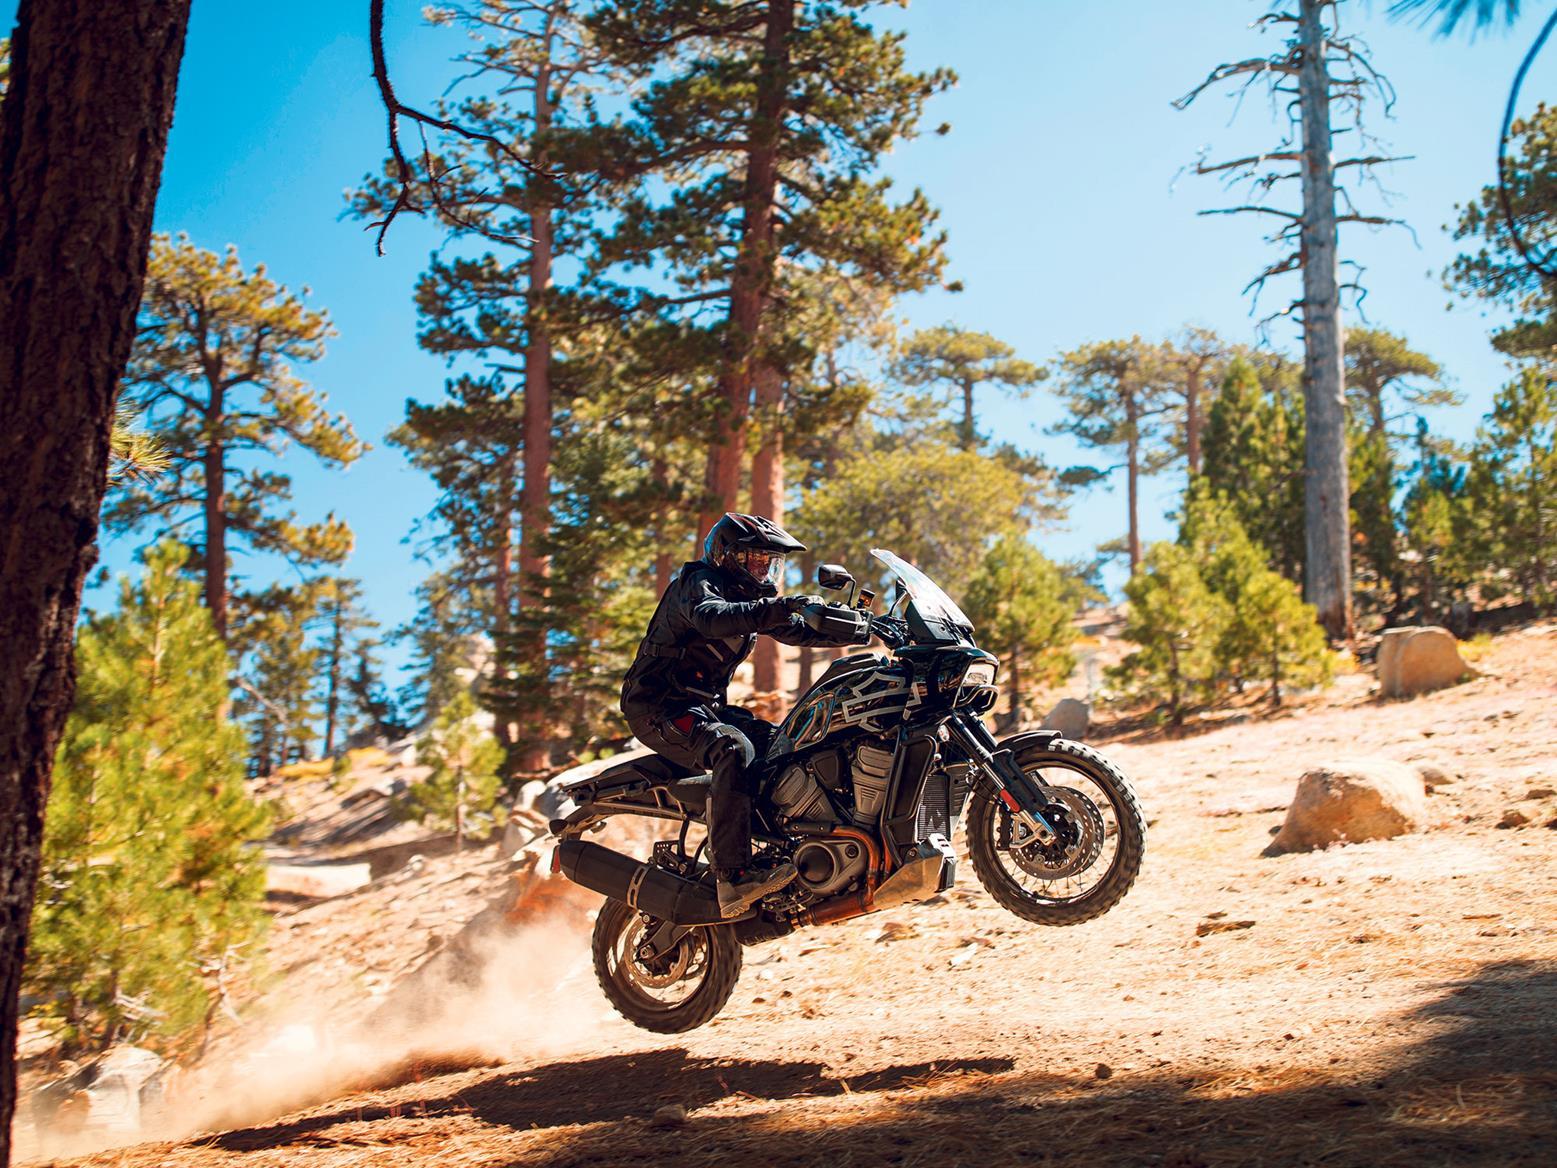 Harley-Davidson Bronx and Pan-America models delayed until 2021